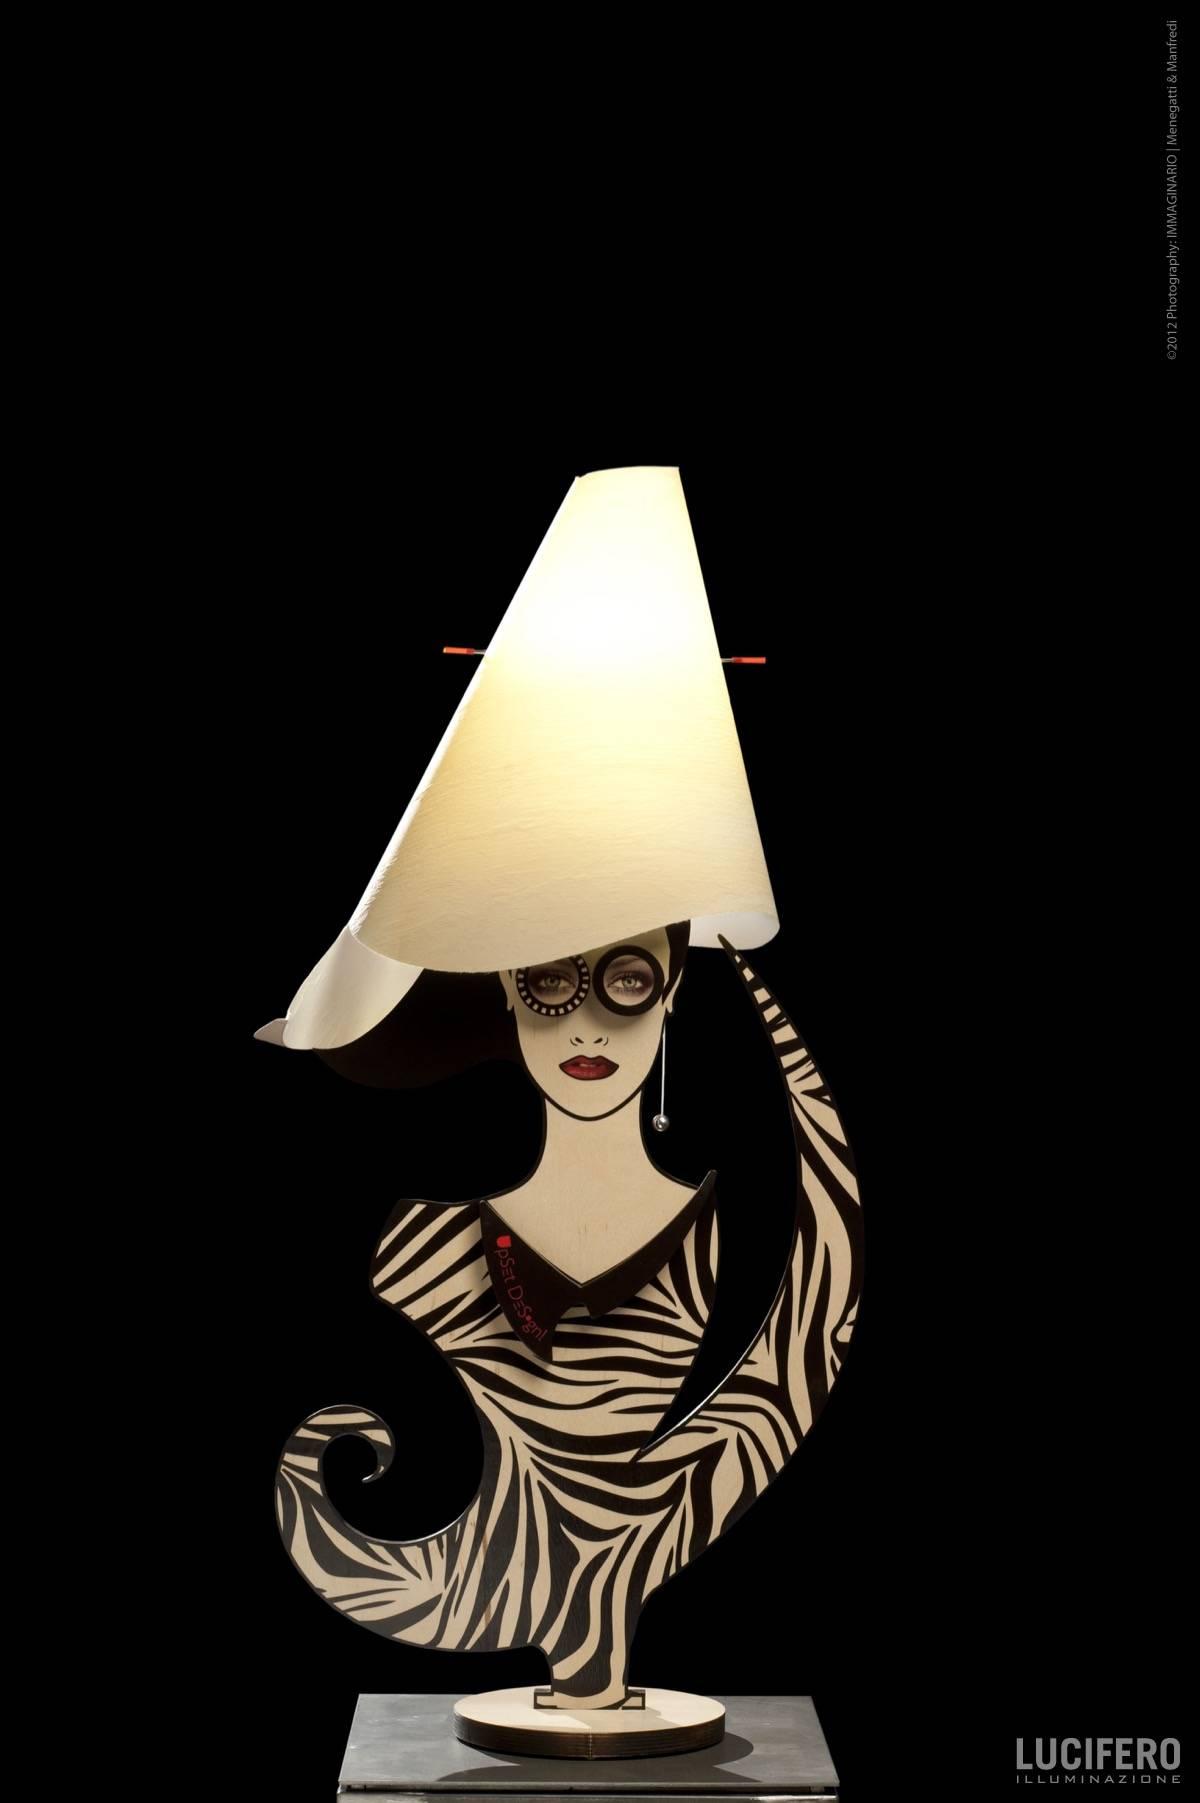 Lucifero Kora Table Lamp